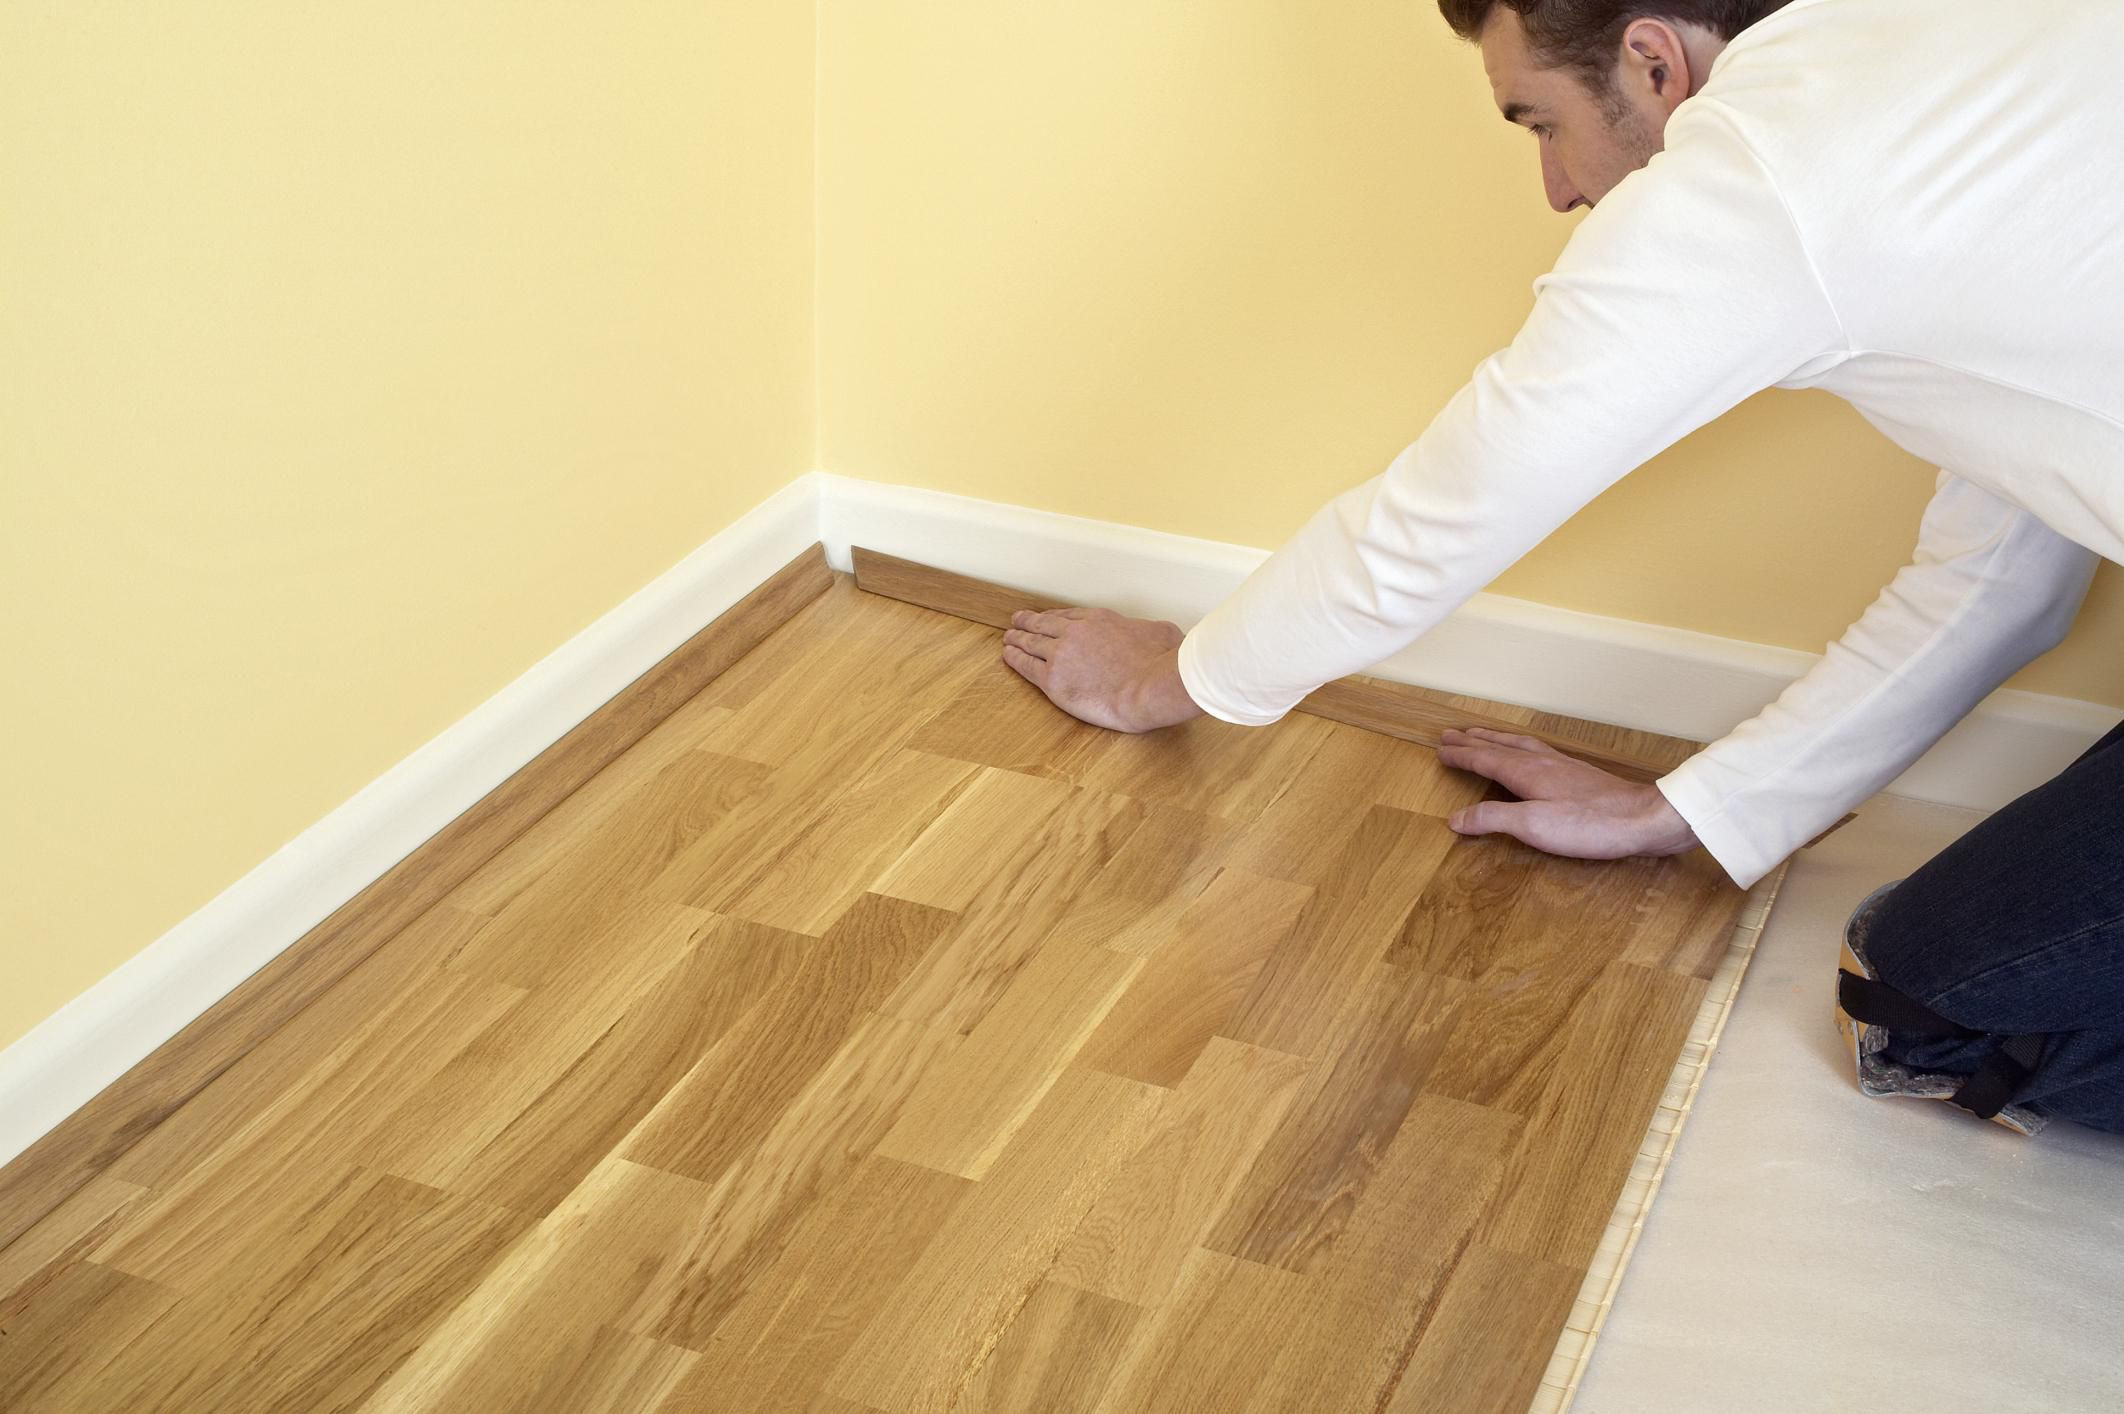 hardwood floor refinishing duluth mn of basics of 12 mm laminate flooring pertaining to 80033008 56a49f155f9b58b7d0d7e0be